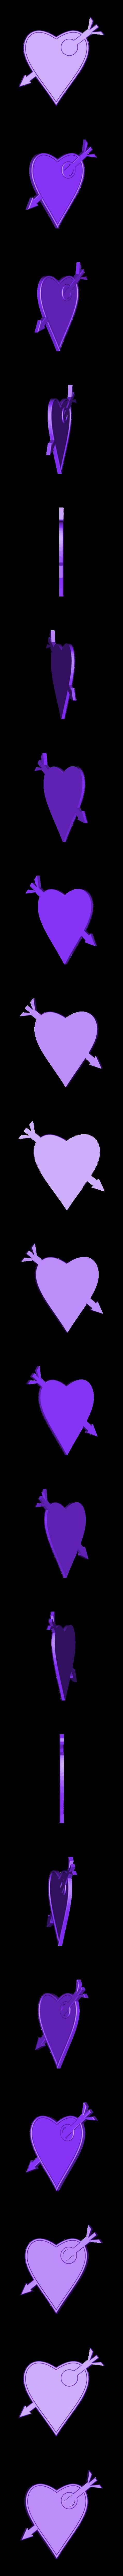 armor_heart.stl Download free STL file Amor heart - love - liebe - amoure - te amo - sign • 3D printing design, squiqui